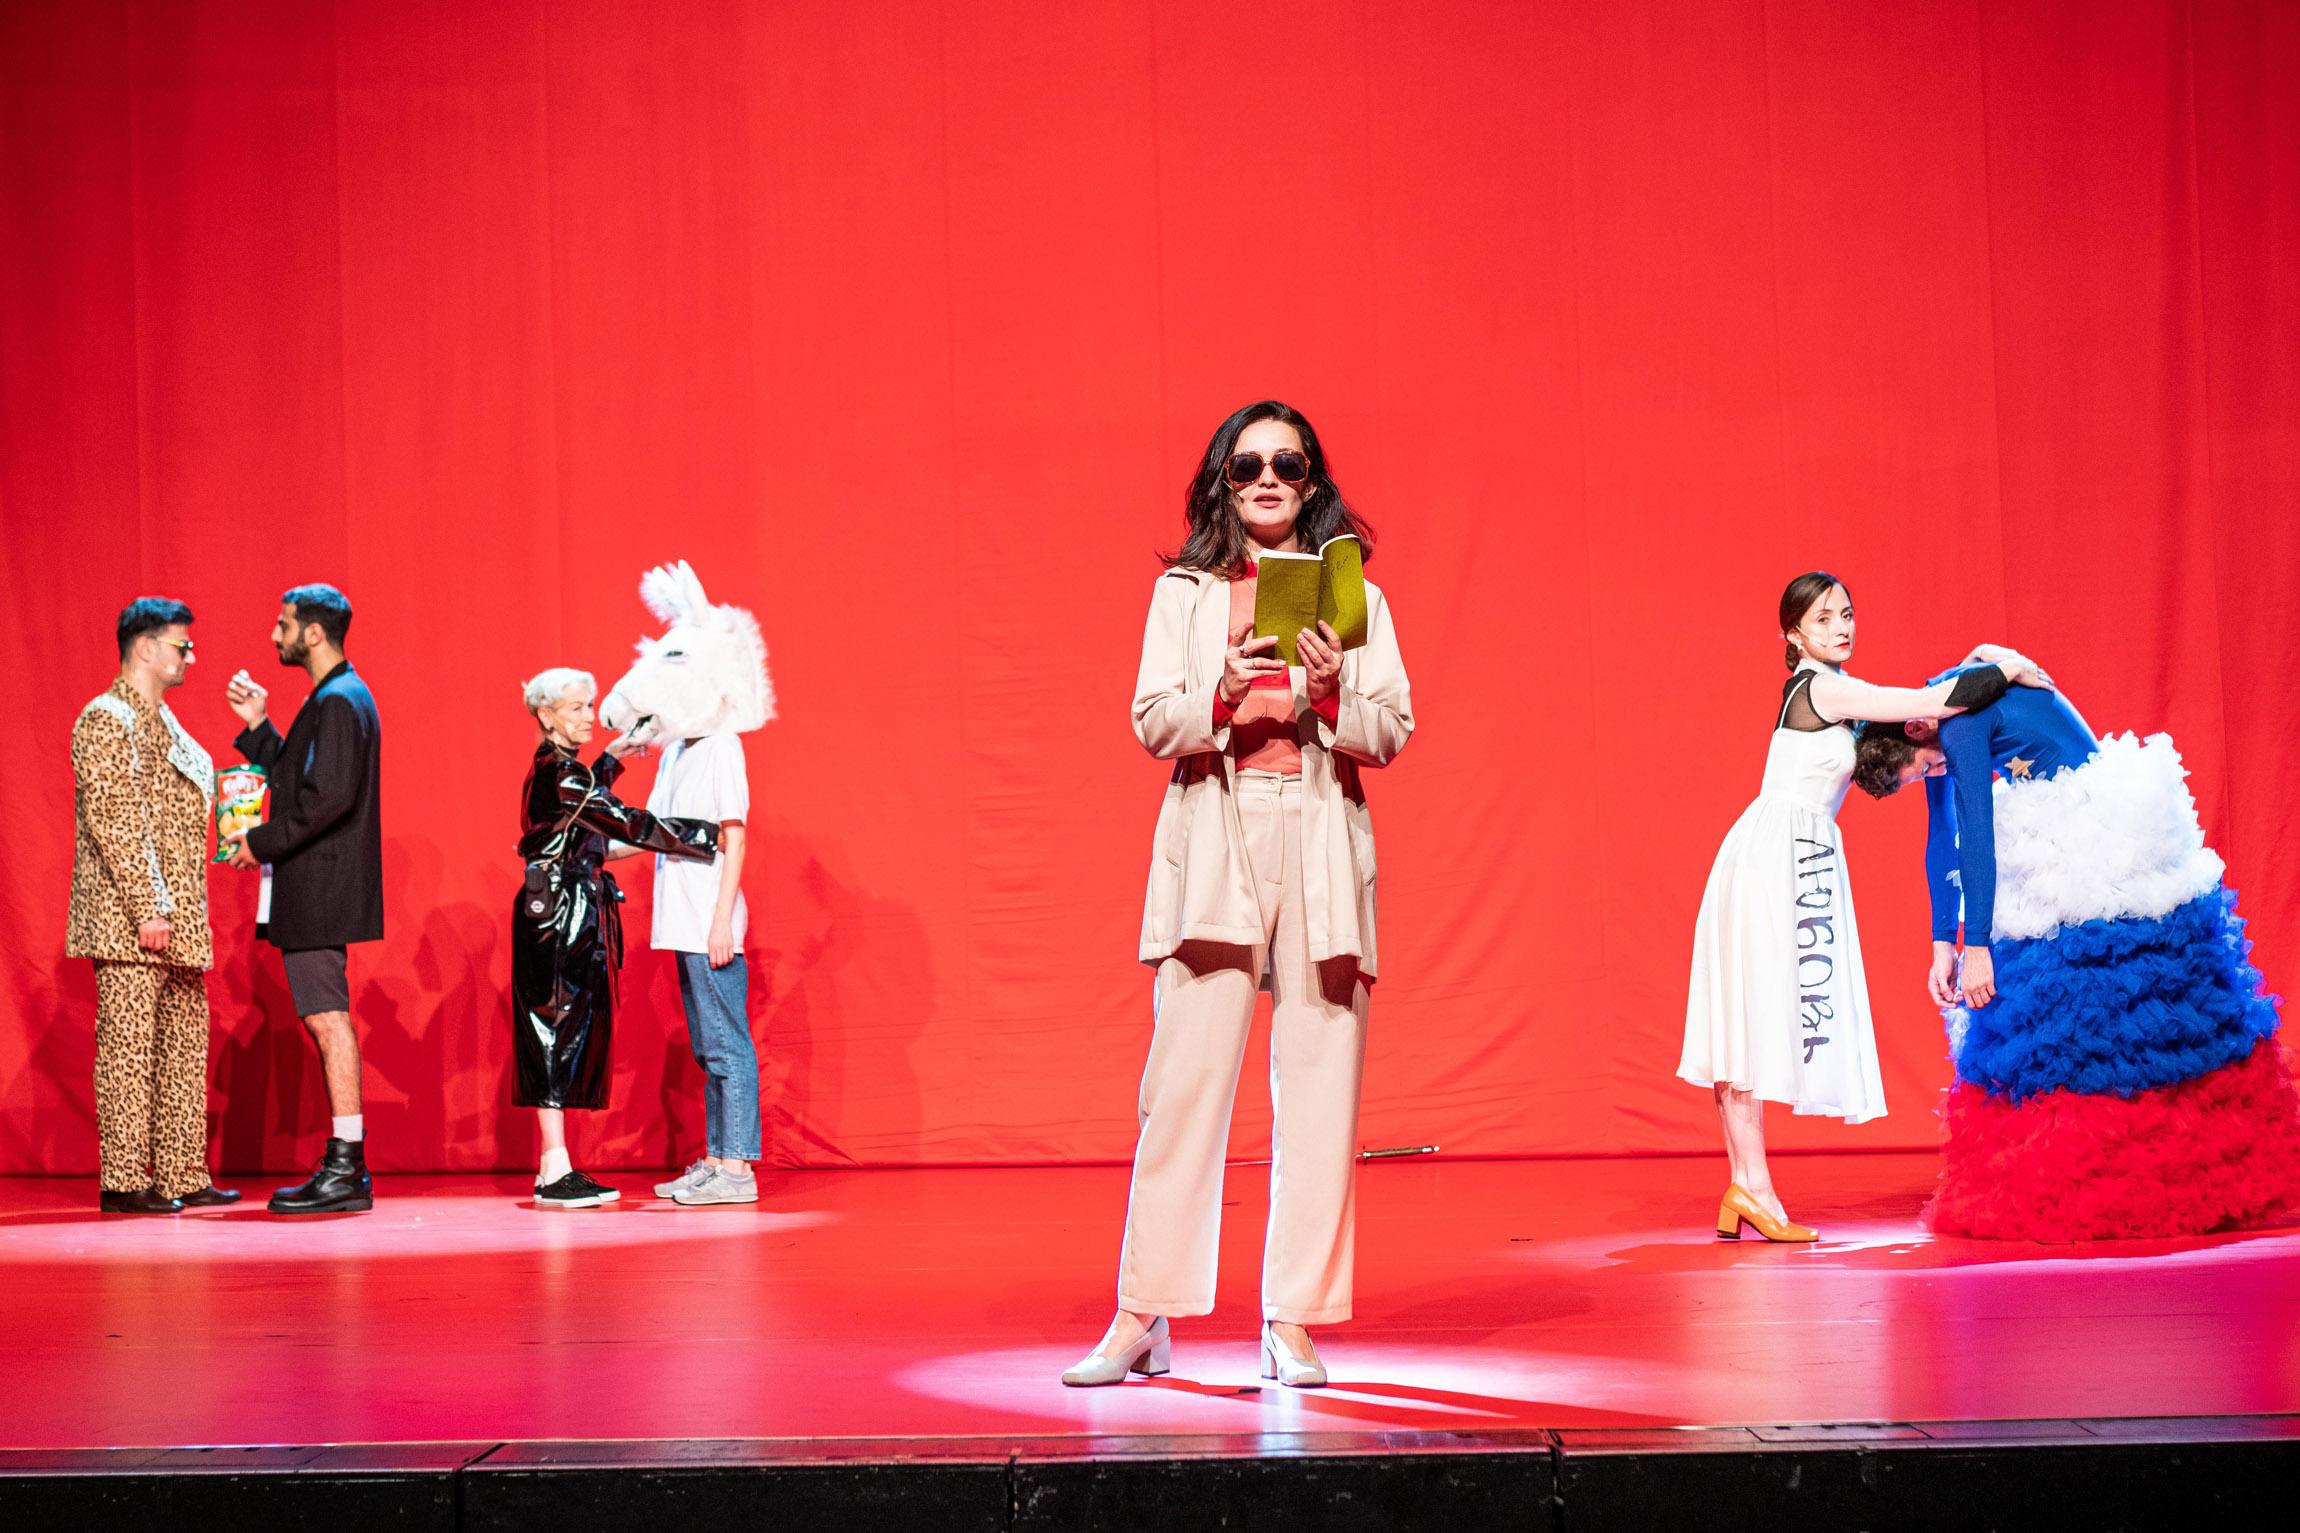 Keti Chukhrov / Guram Matskhonashvili,  Global Congress of Post-Prostitution , 2019, performance, Orpheum Graz, photo: Mathias Völzke